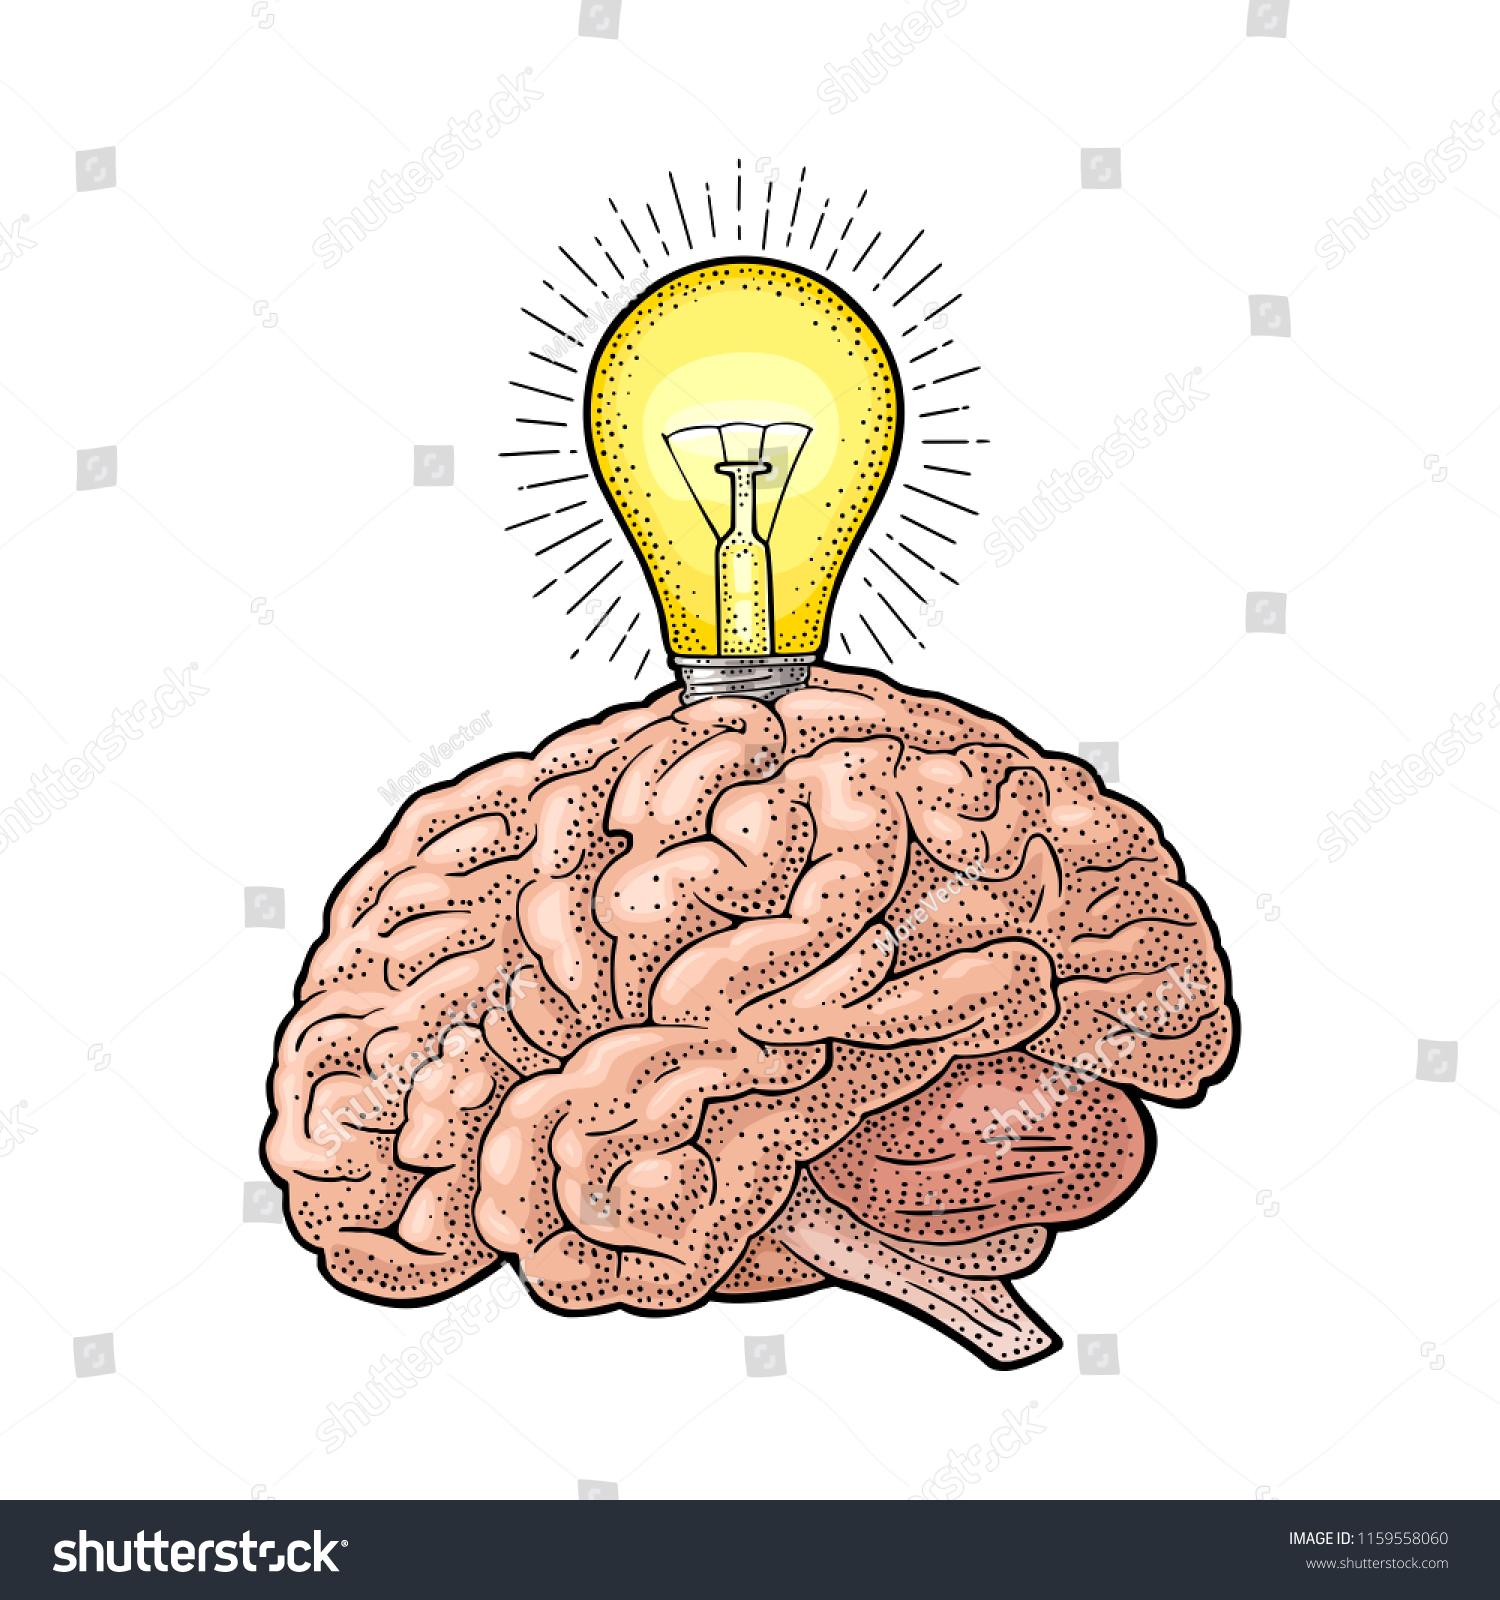 Human Anatomy Brain Glowing Light Incandescent Stock Vector (Royalty ...